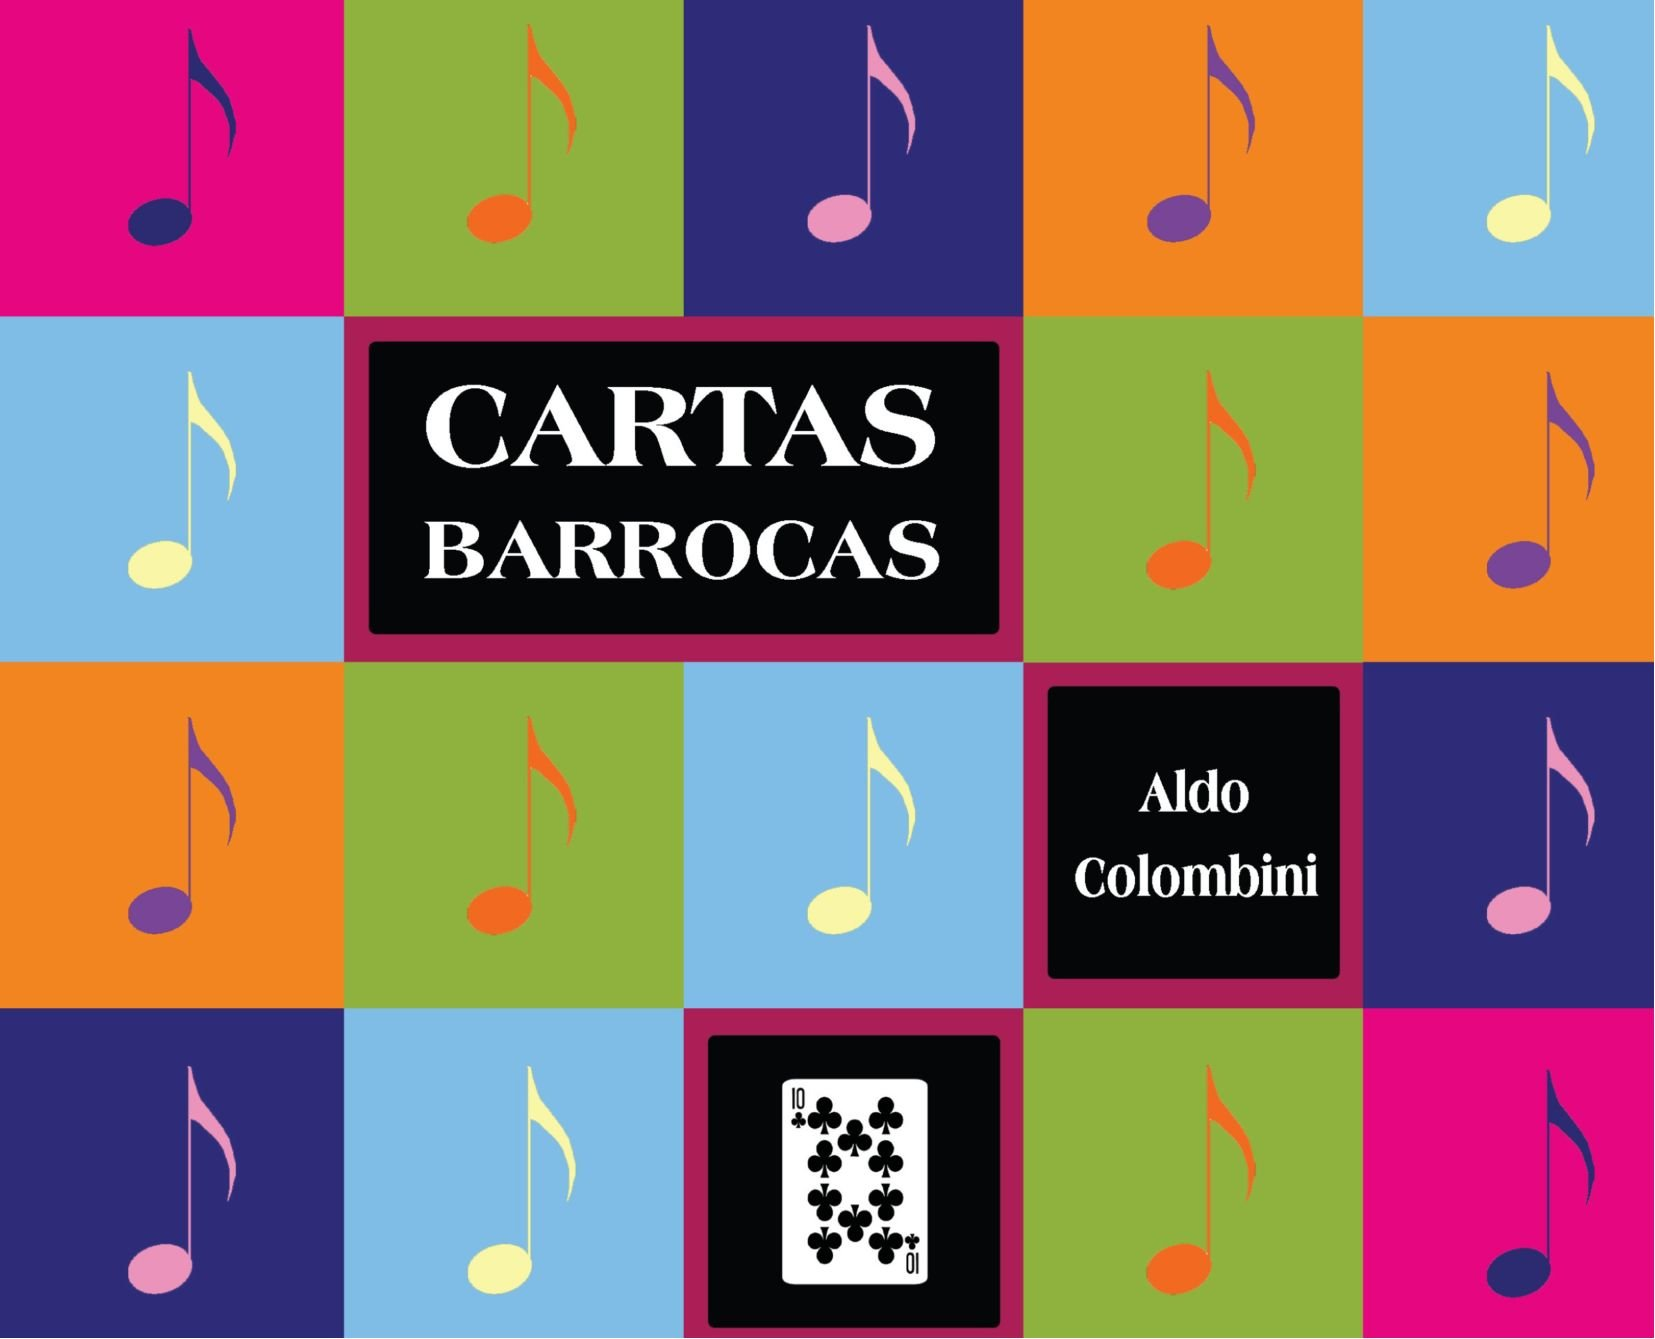 Cartas barrocas (Spanish Edition): Aldo Colombini ...